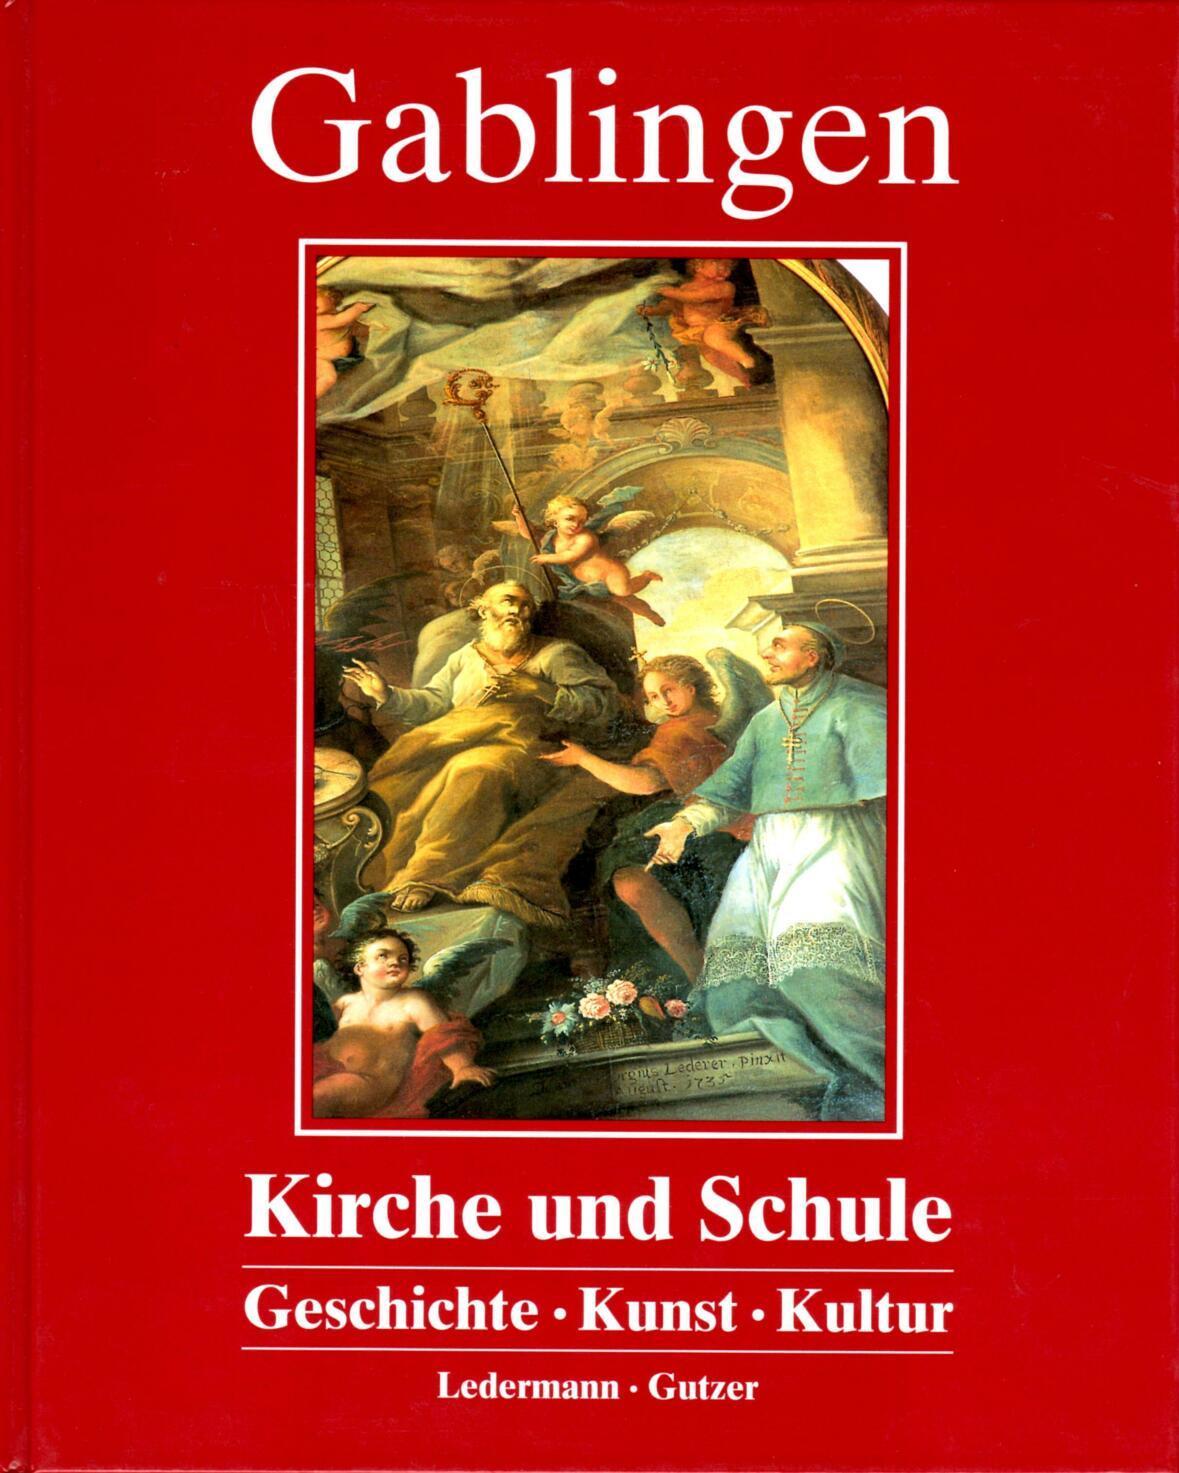 Buch_Gablingen Kirche und Schule